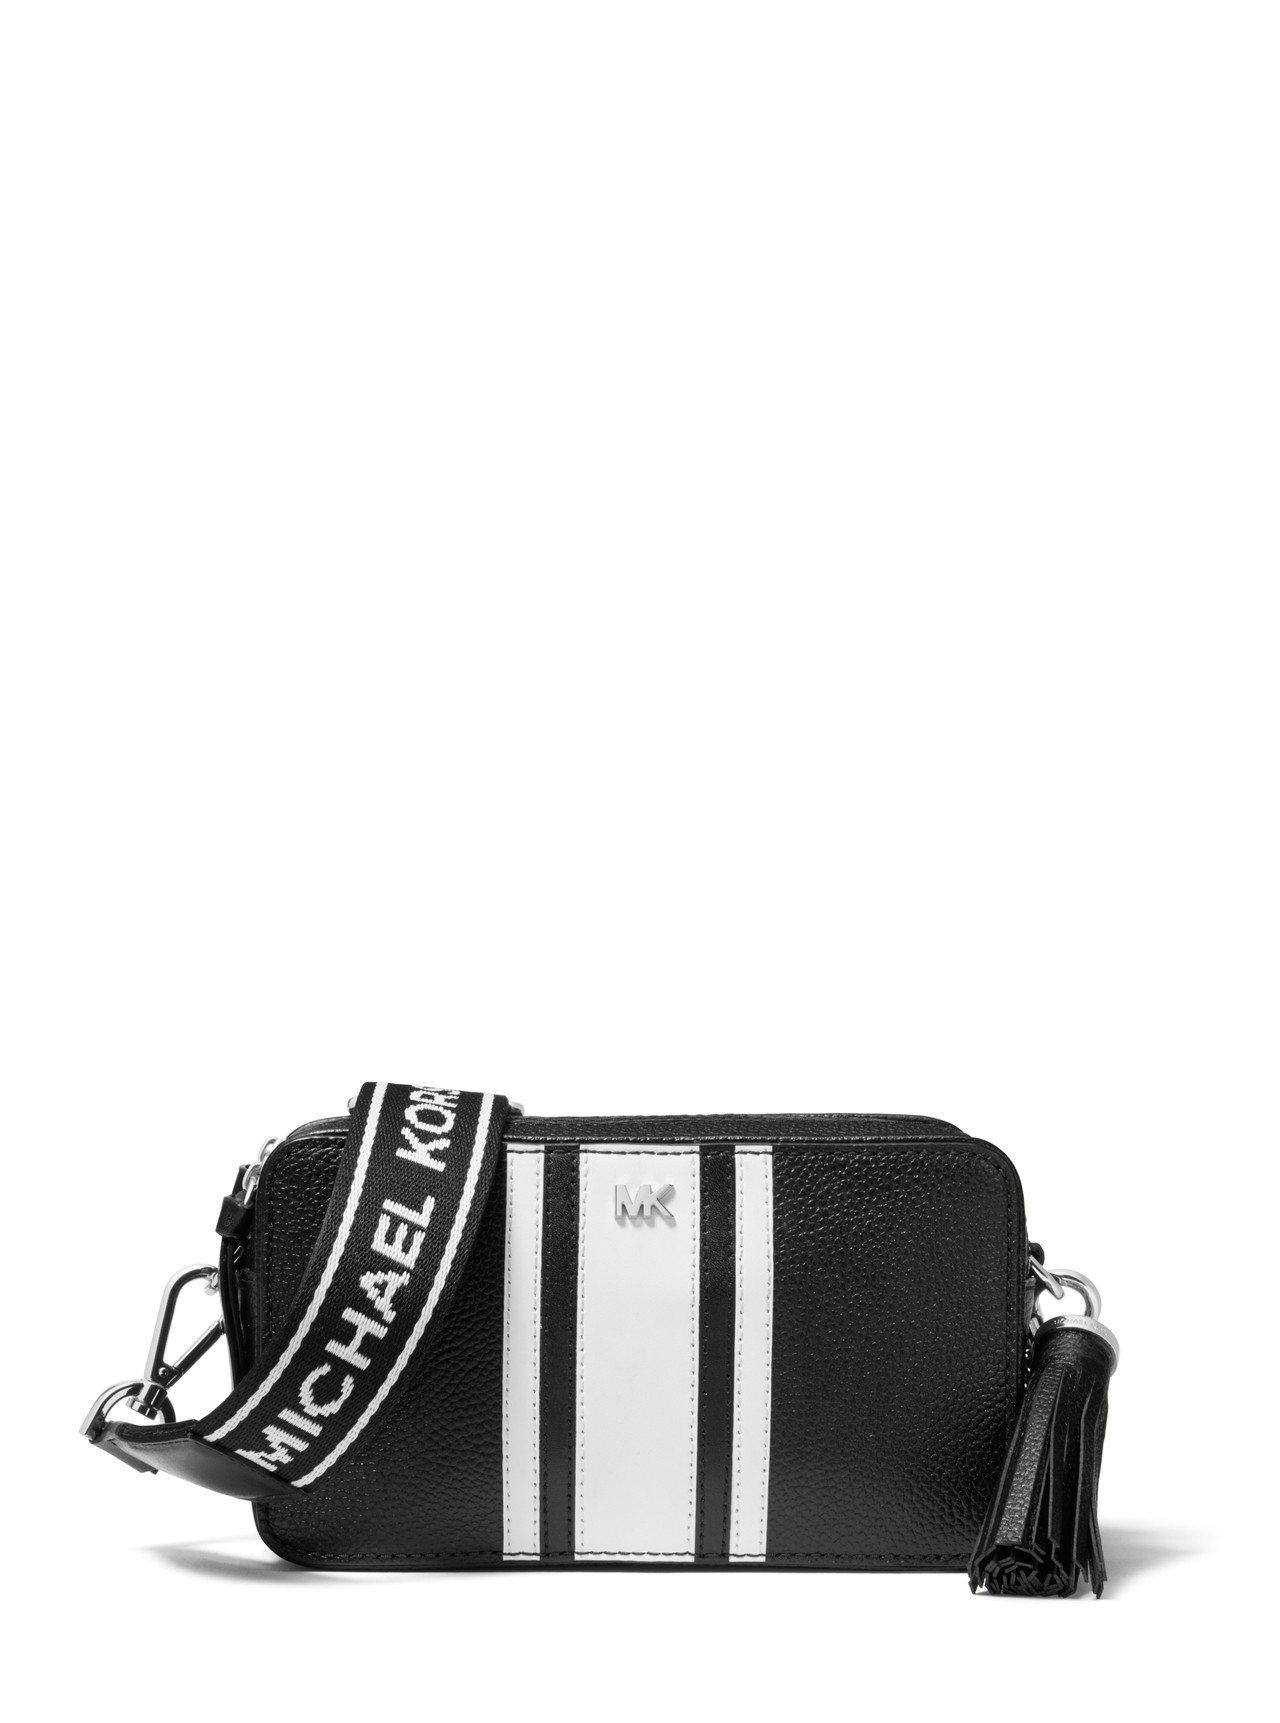 MMK黑白拼接小斜肩包,售價12,800元。圖/COACH提供